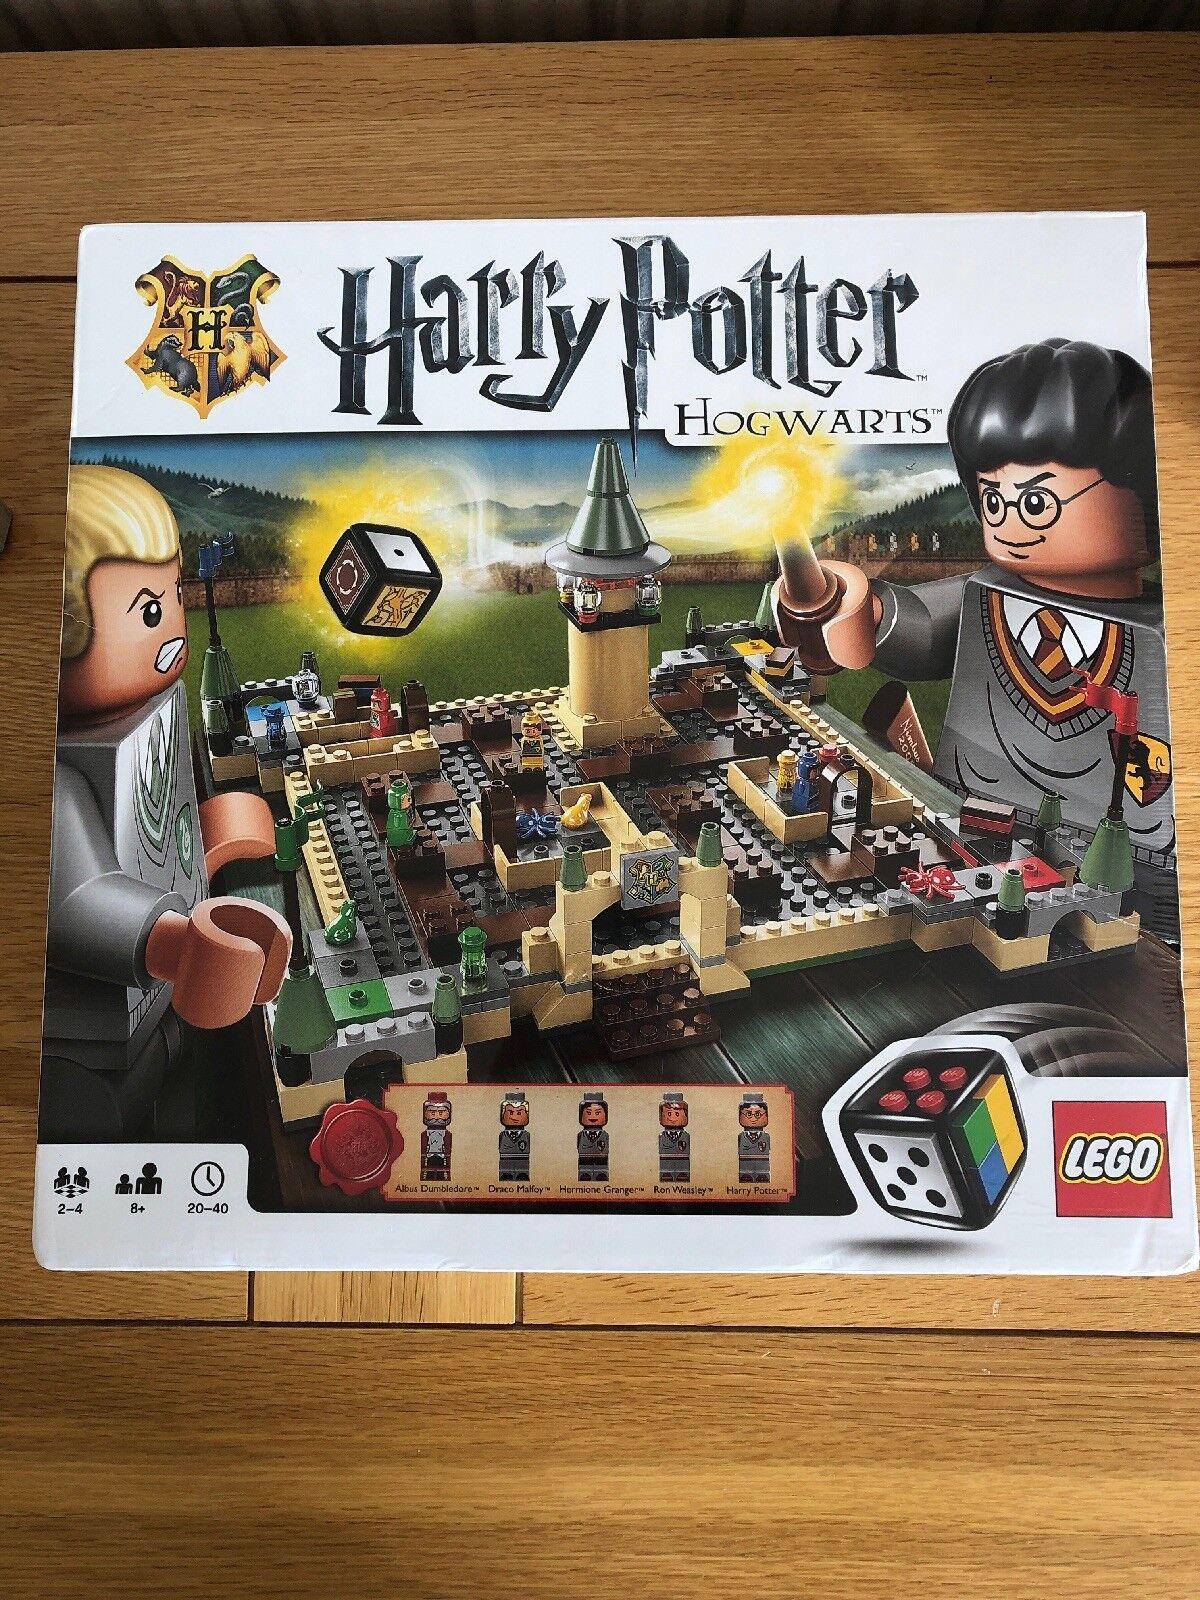 LEGO Harry Potter Hogwarts Game 3862 Released 2010 Rare New & Sealed